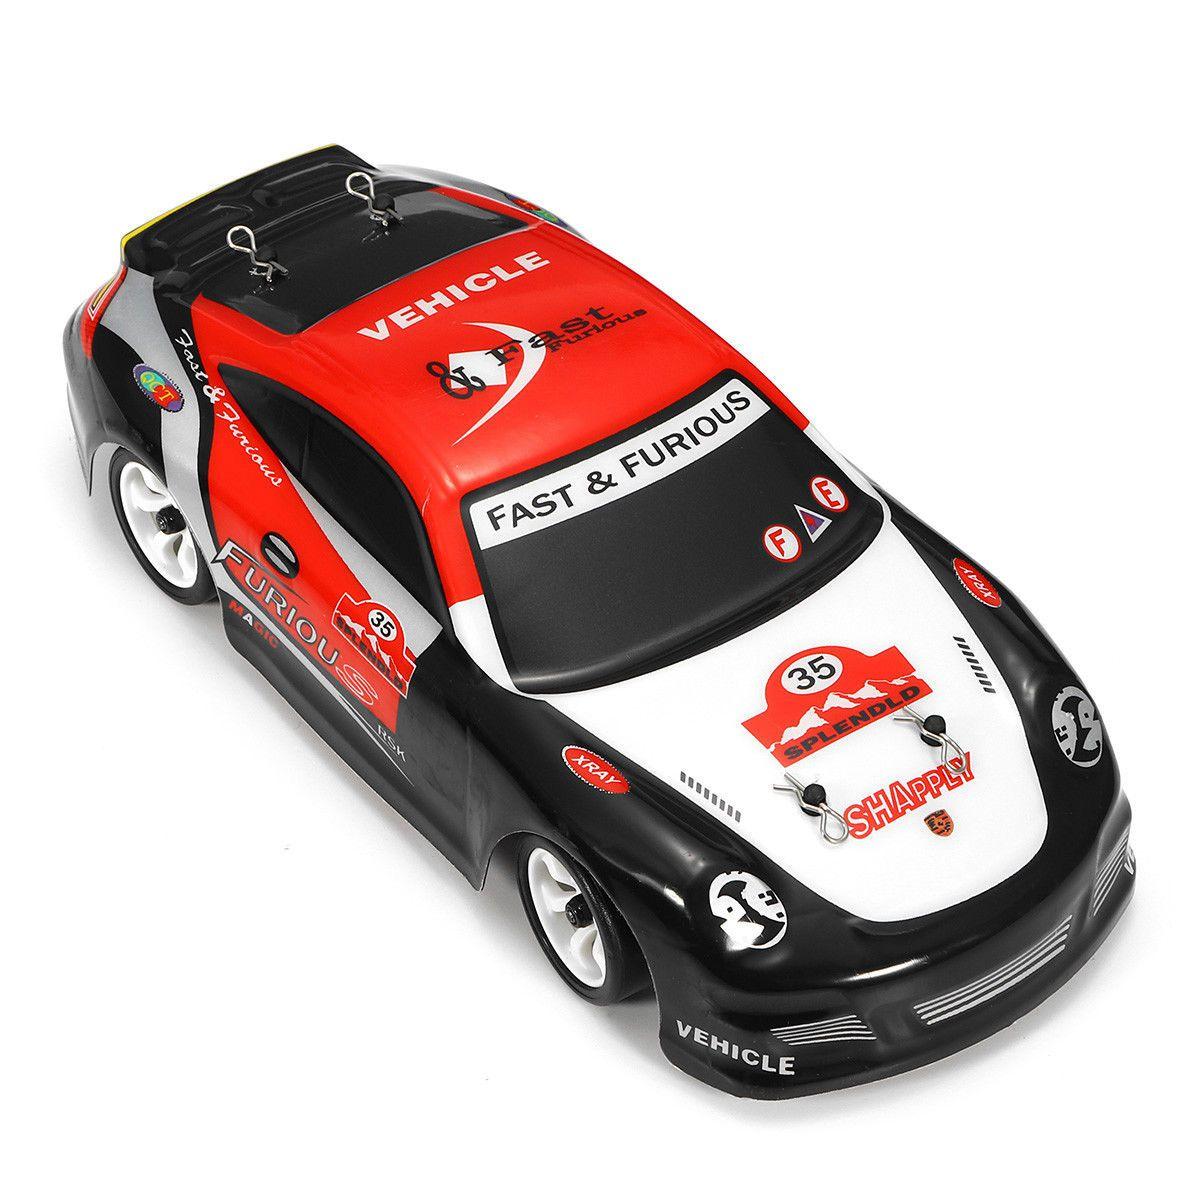 Wltoys K969 1/28 2.4G 4WD Brushed RC Car High Speed Drift Car Toy For Kids, EU Plug wltoys k969 1 28 2 4g 4wd electric rc car 30kmh rtr version high speed drift car